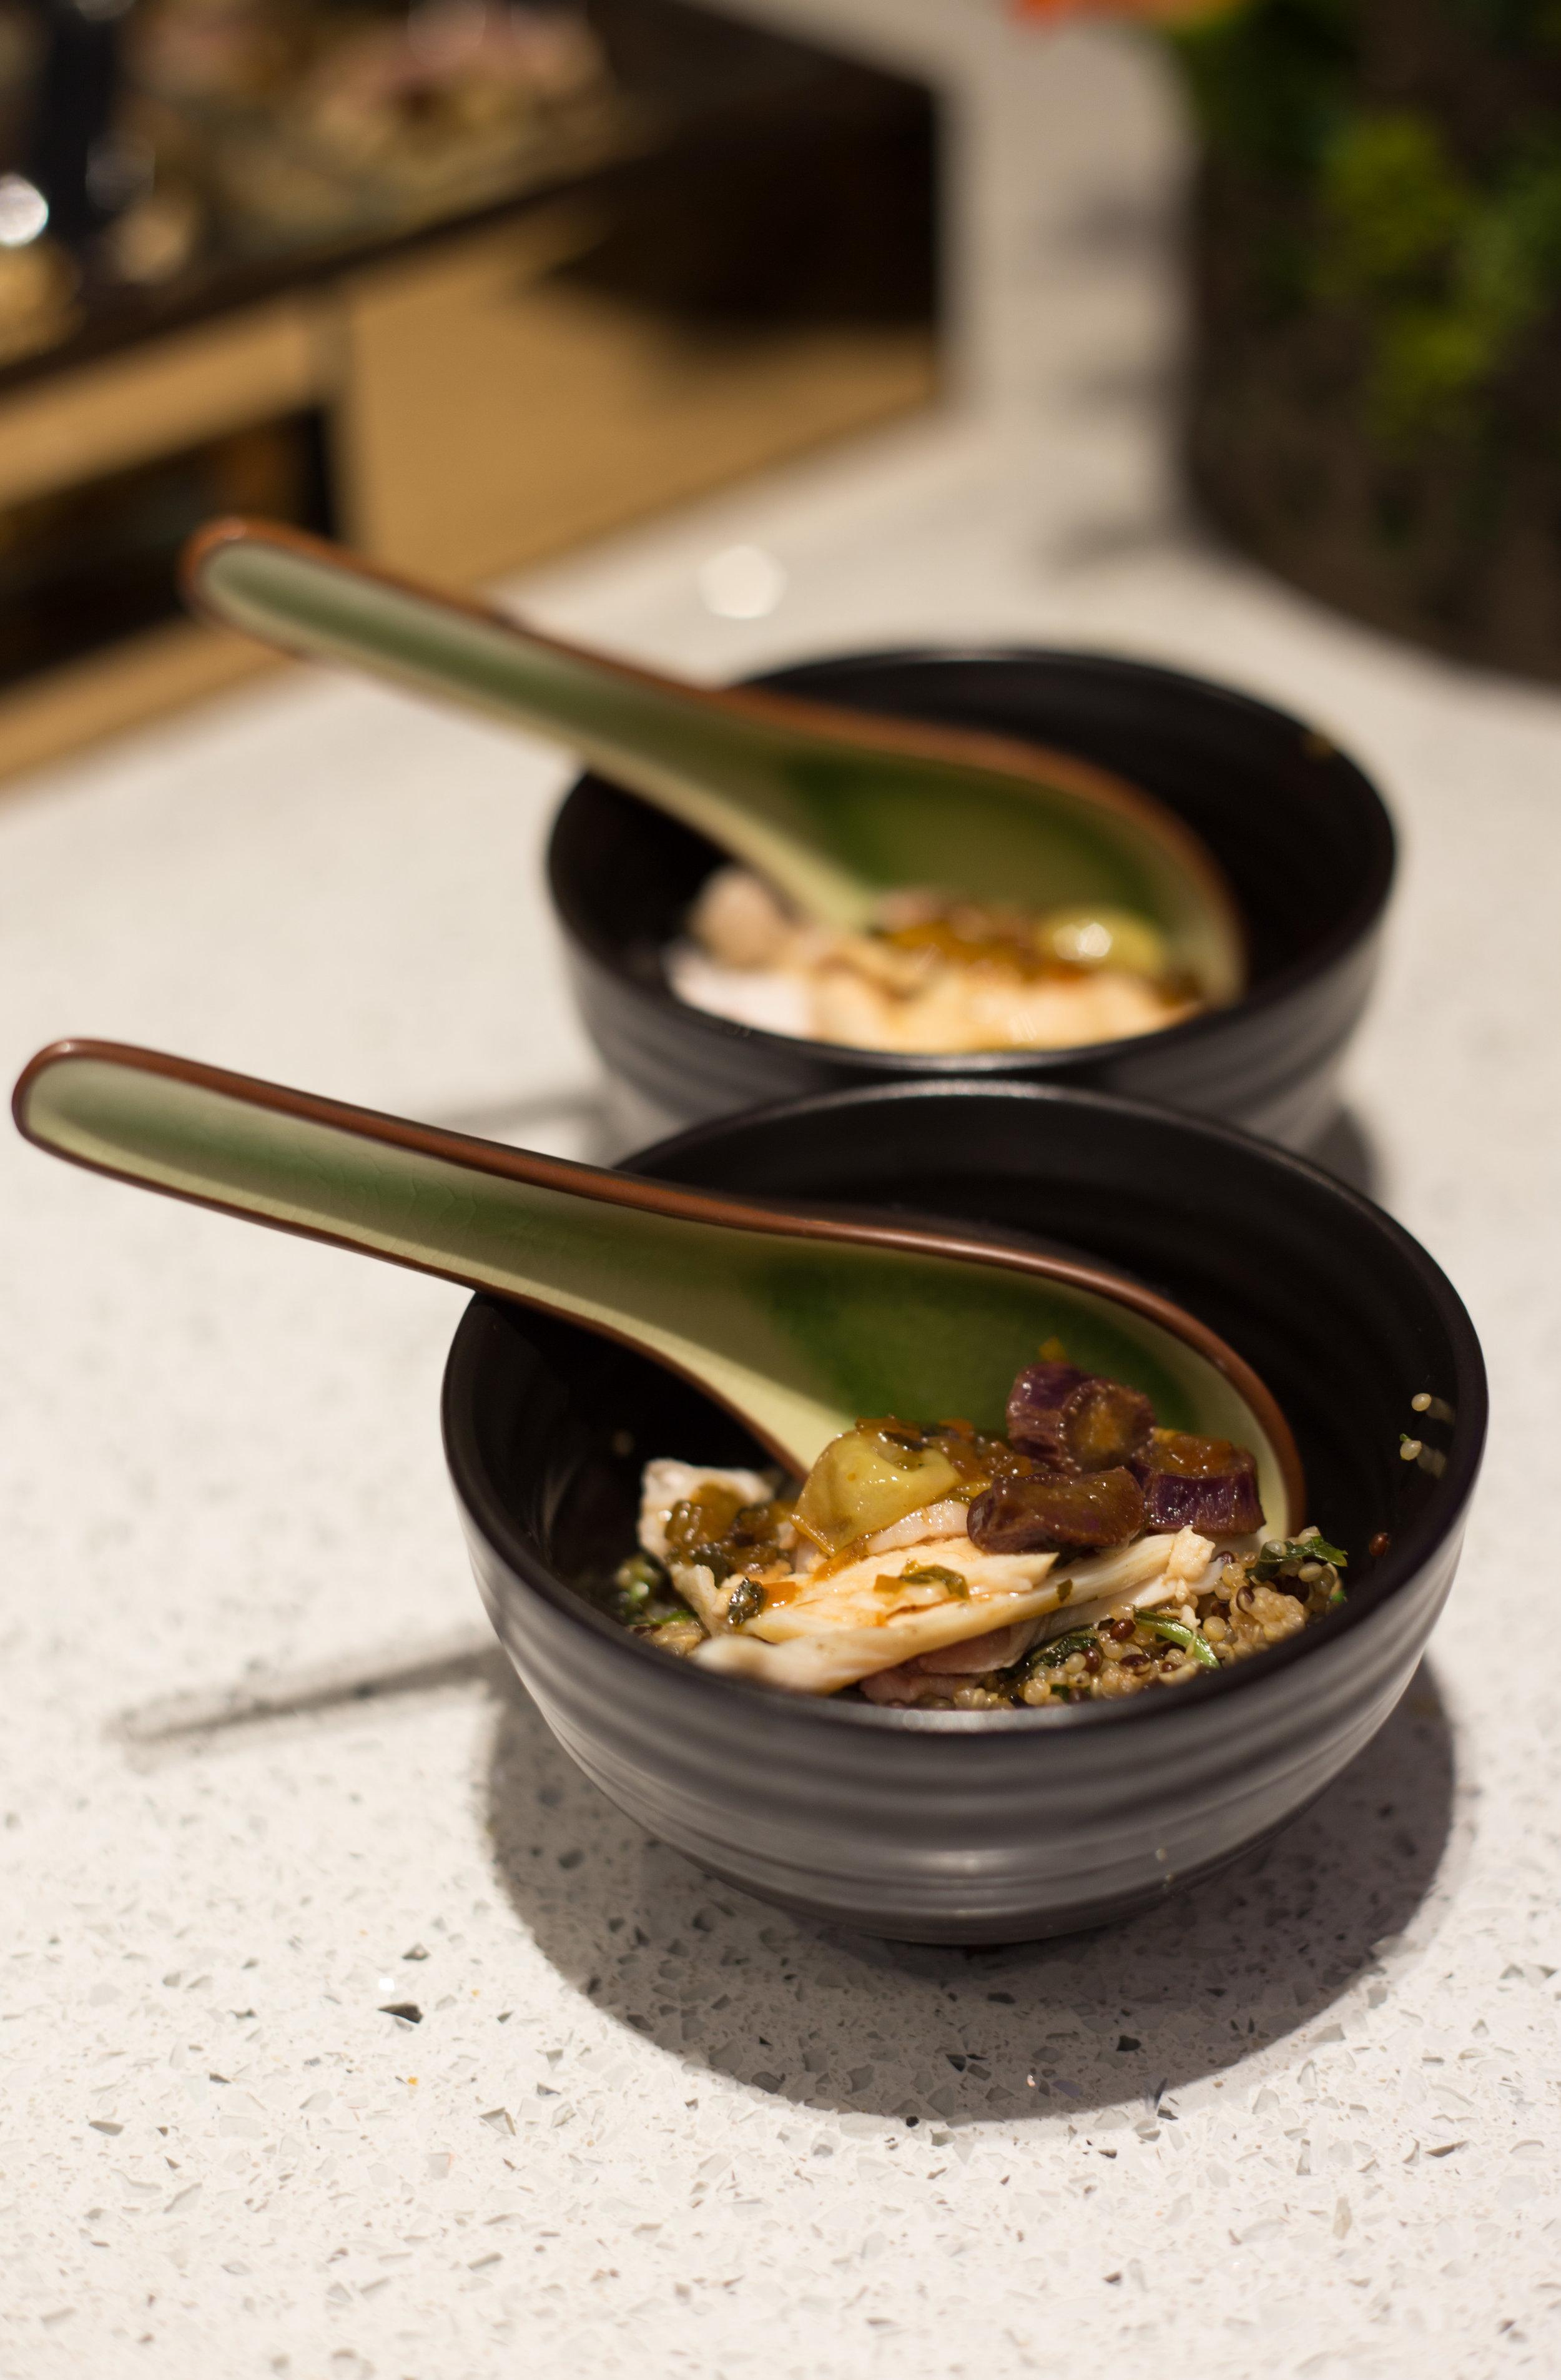 Pearl barley risotto, butter grape chicken with tarragon